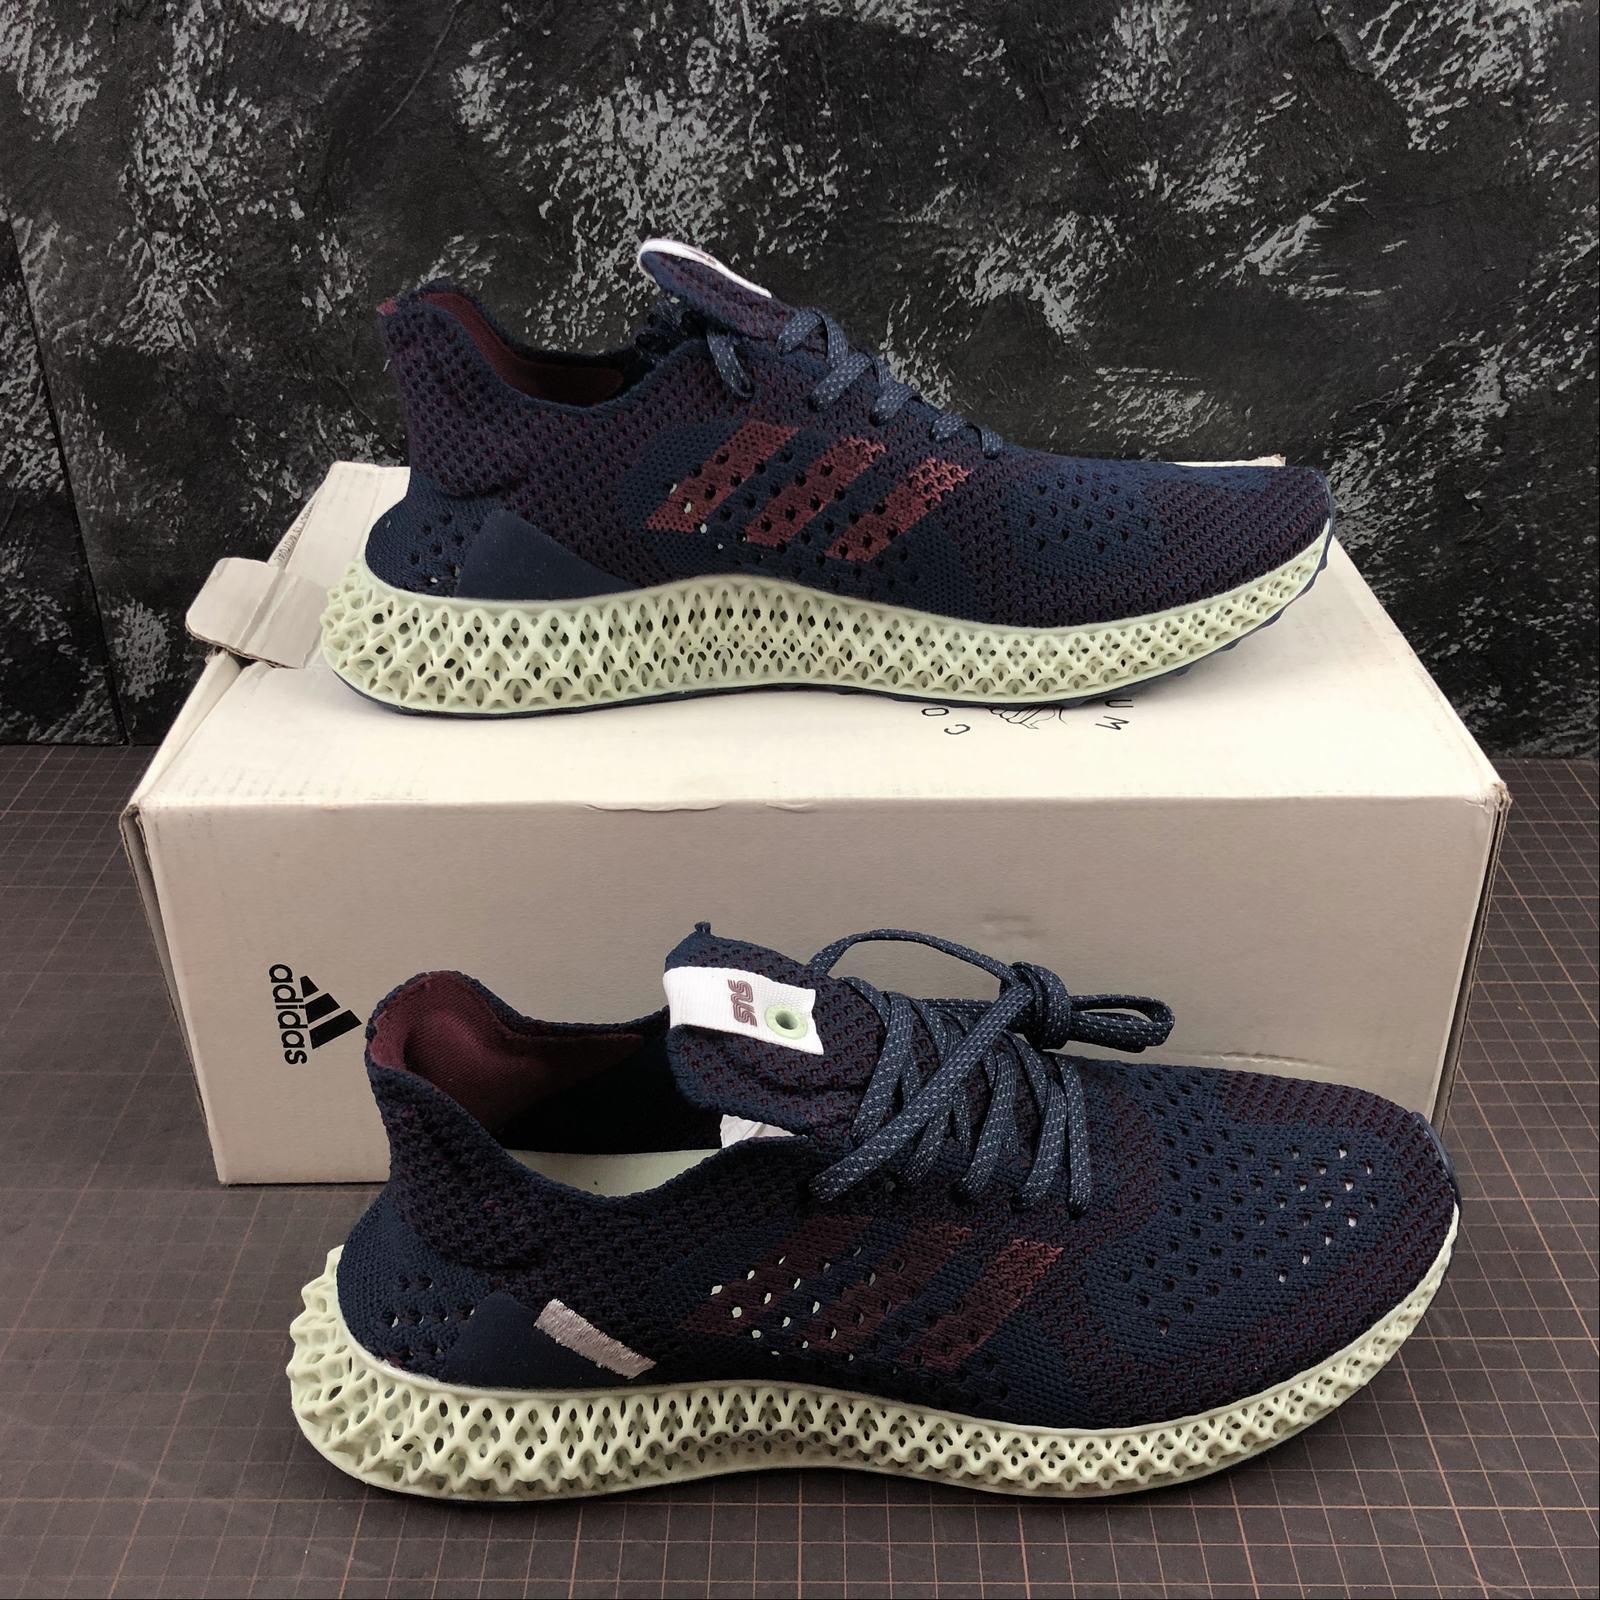 giay-sneaker-adidas-consortium-runner-inv-4d-b96653